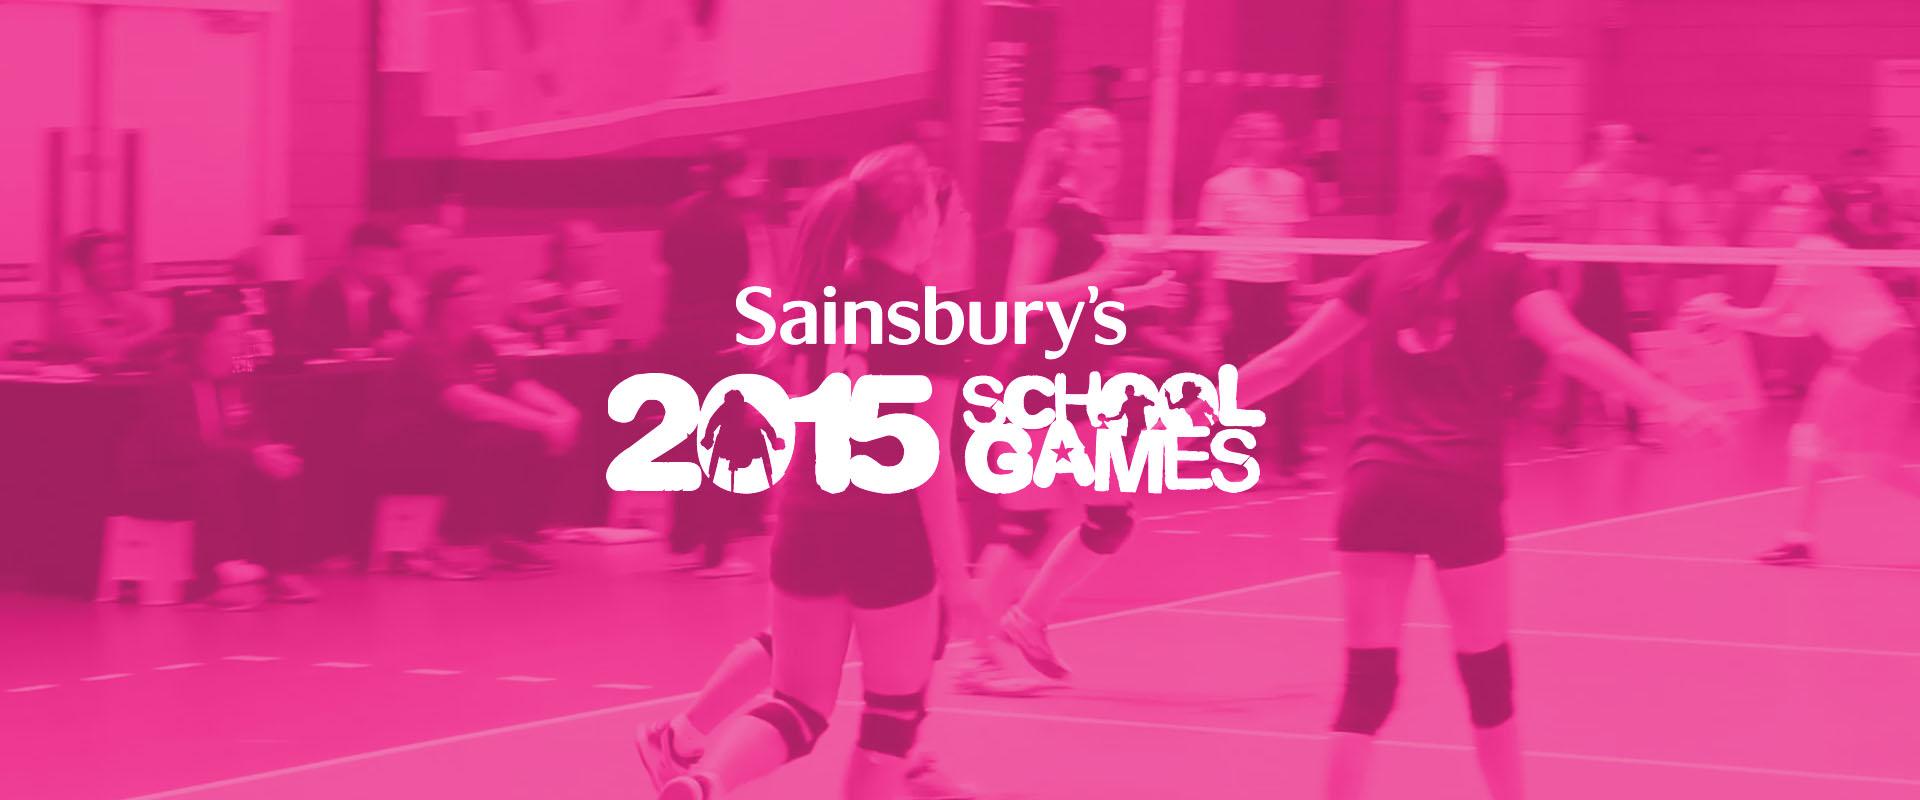 sainsburys school games manchester sport show thumbnail